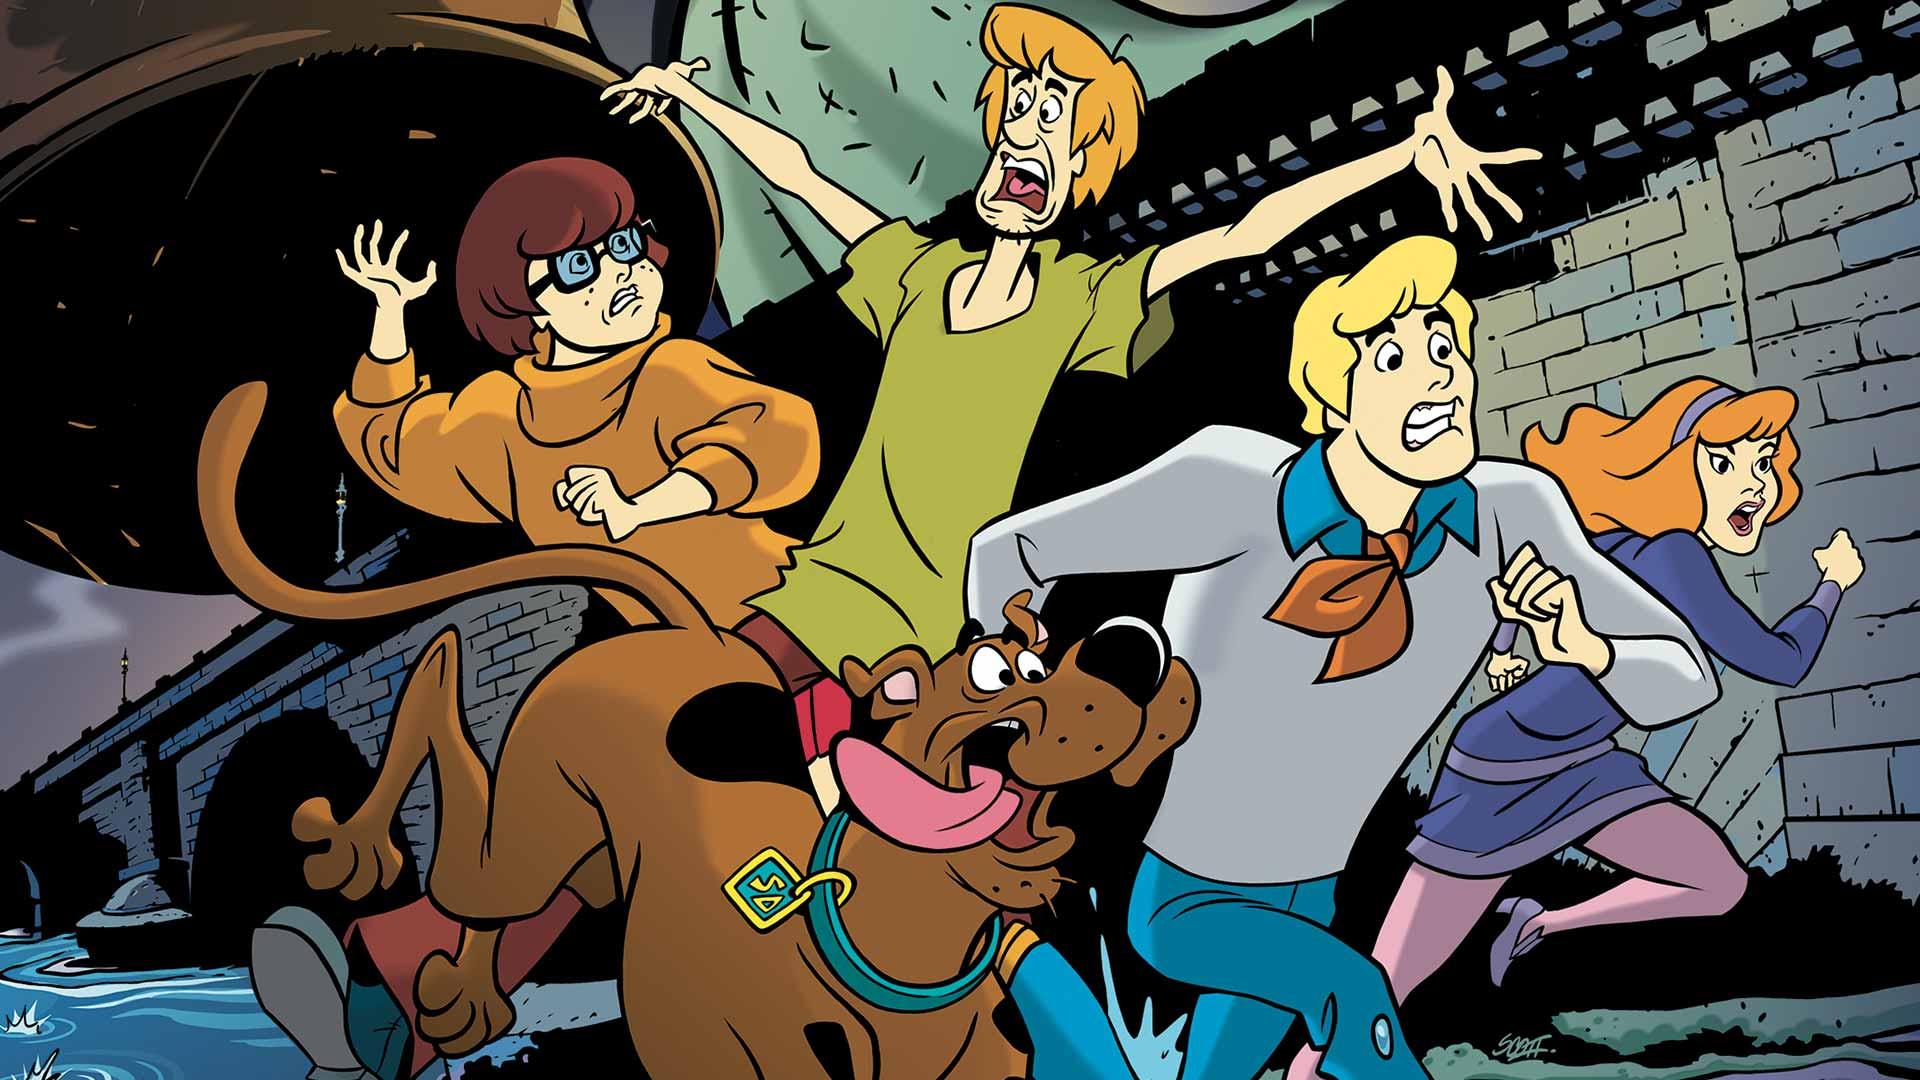 Hanna Barbera Scooby Doo.jpg